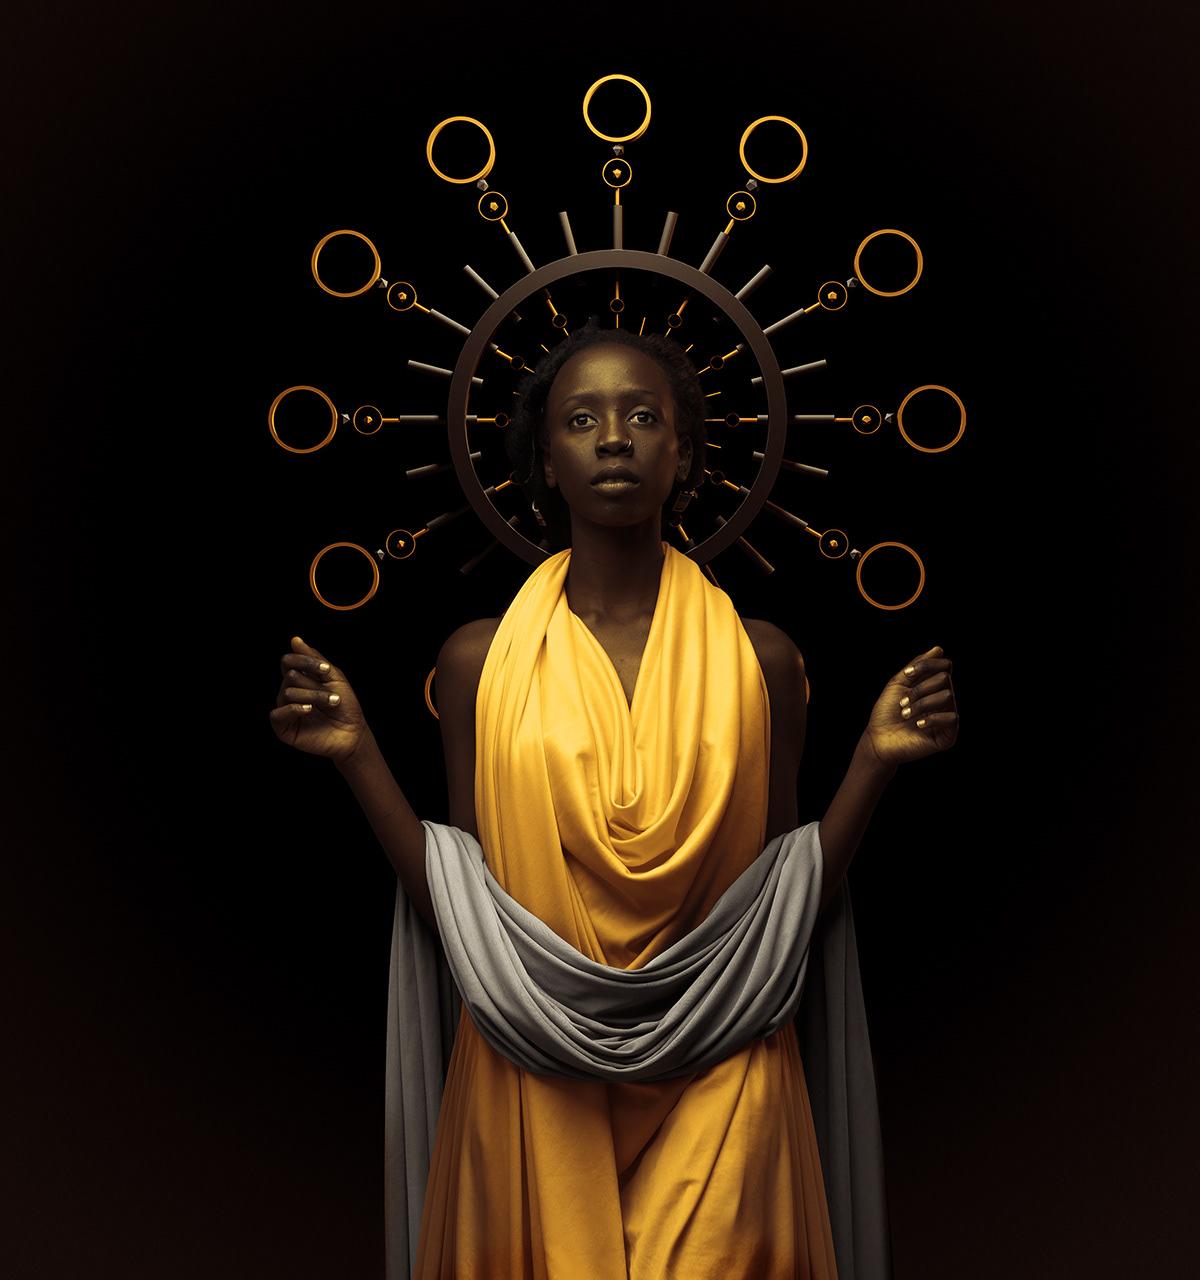 black kenya africa melanin royalty wakanda